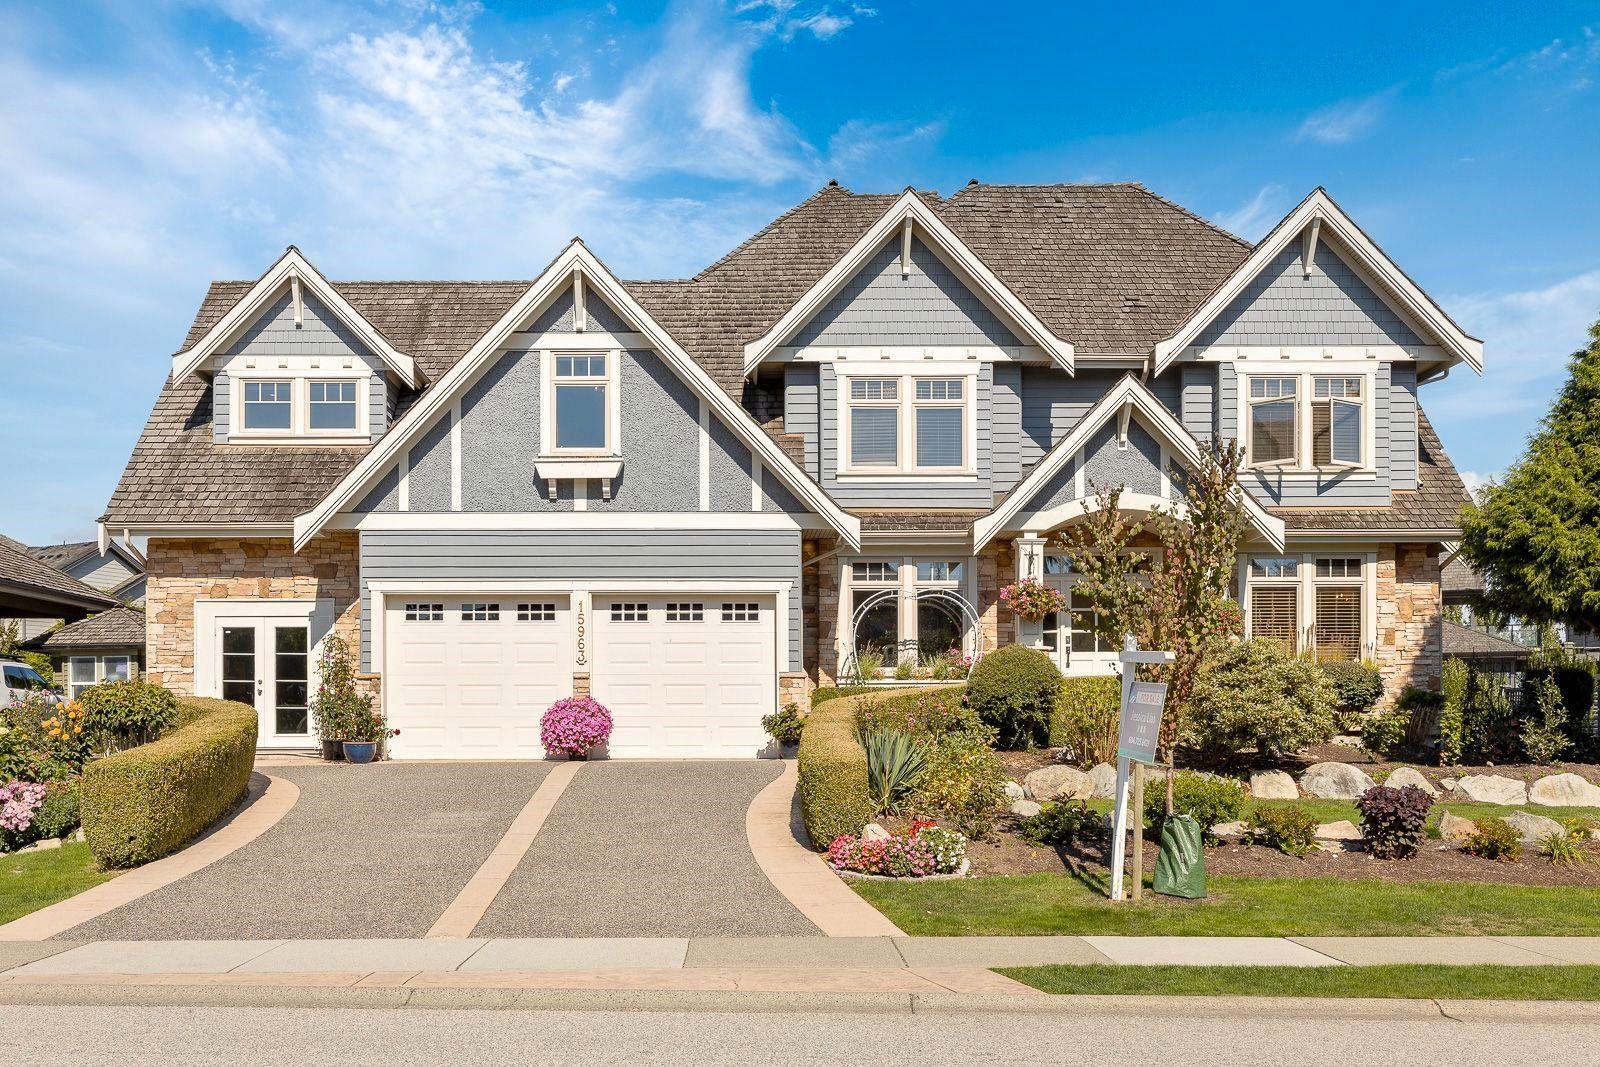 Main Photo: 15963 DEVONSHIRE Drive in Surrey: Morgan Creek House for sale (South Surrey White Rock)  : MLS®# R2615762